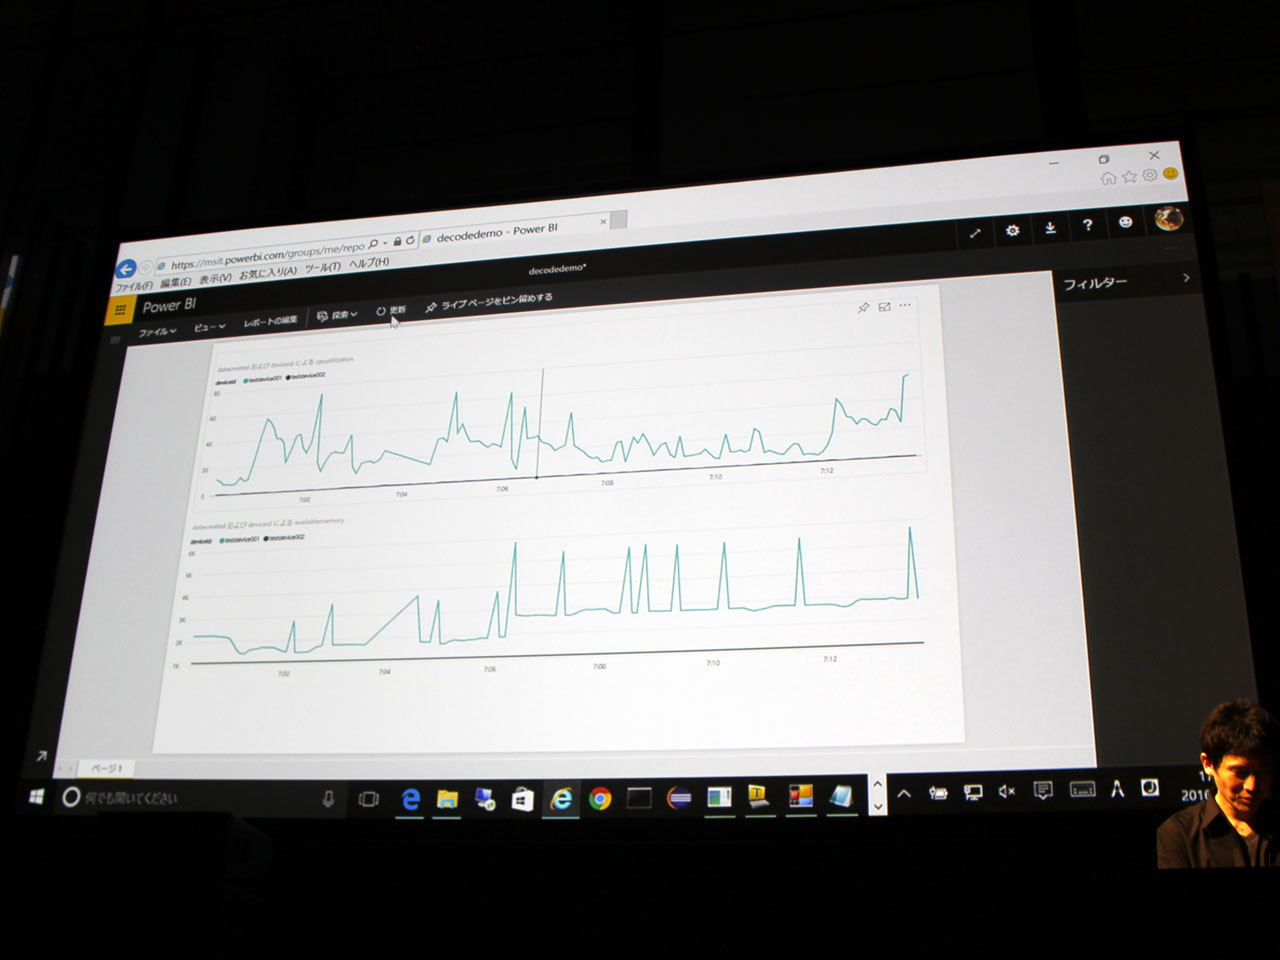 Power BIでのリアルタイム分析の表示例